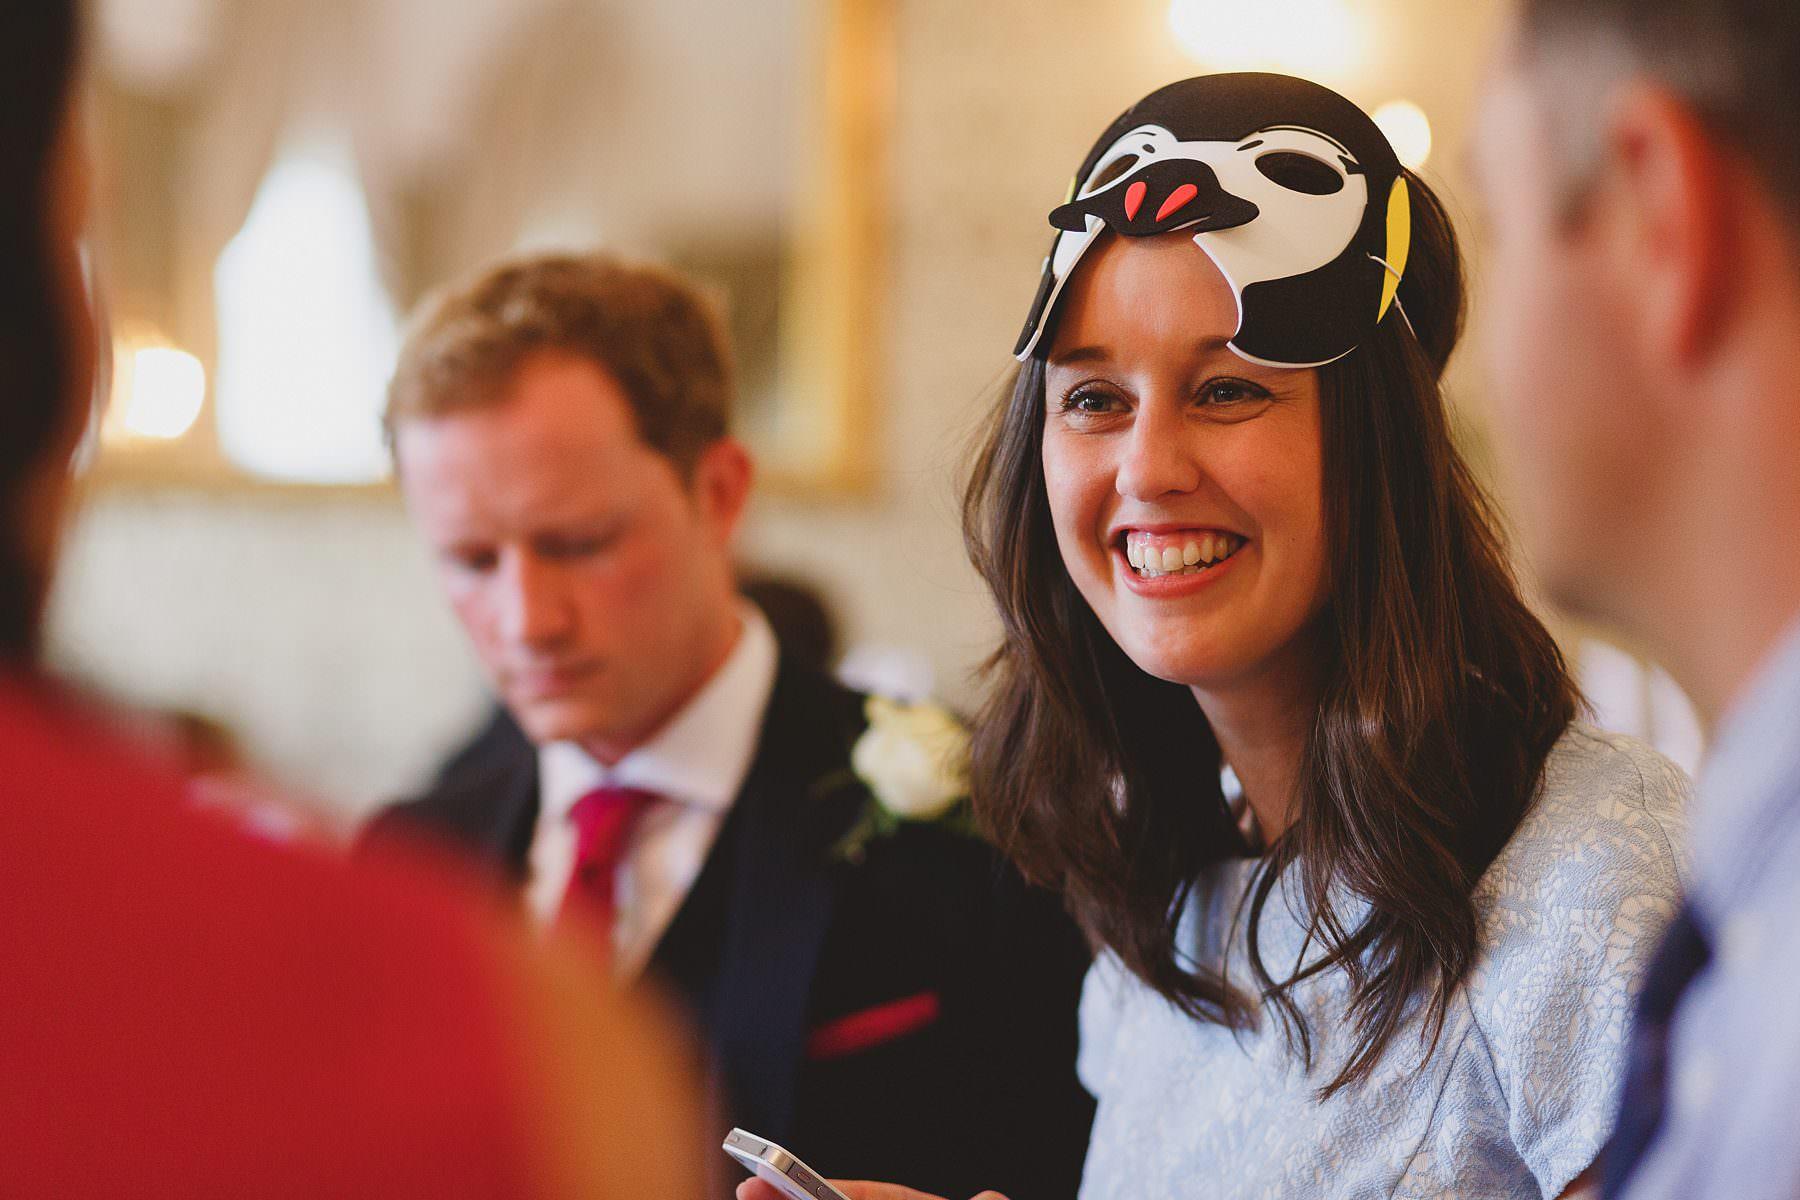 weddings-at-bristol-zoo-020